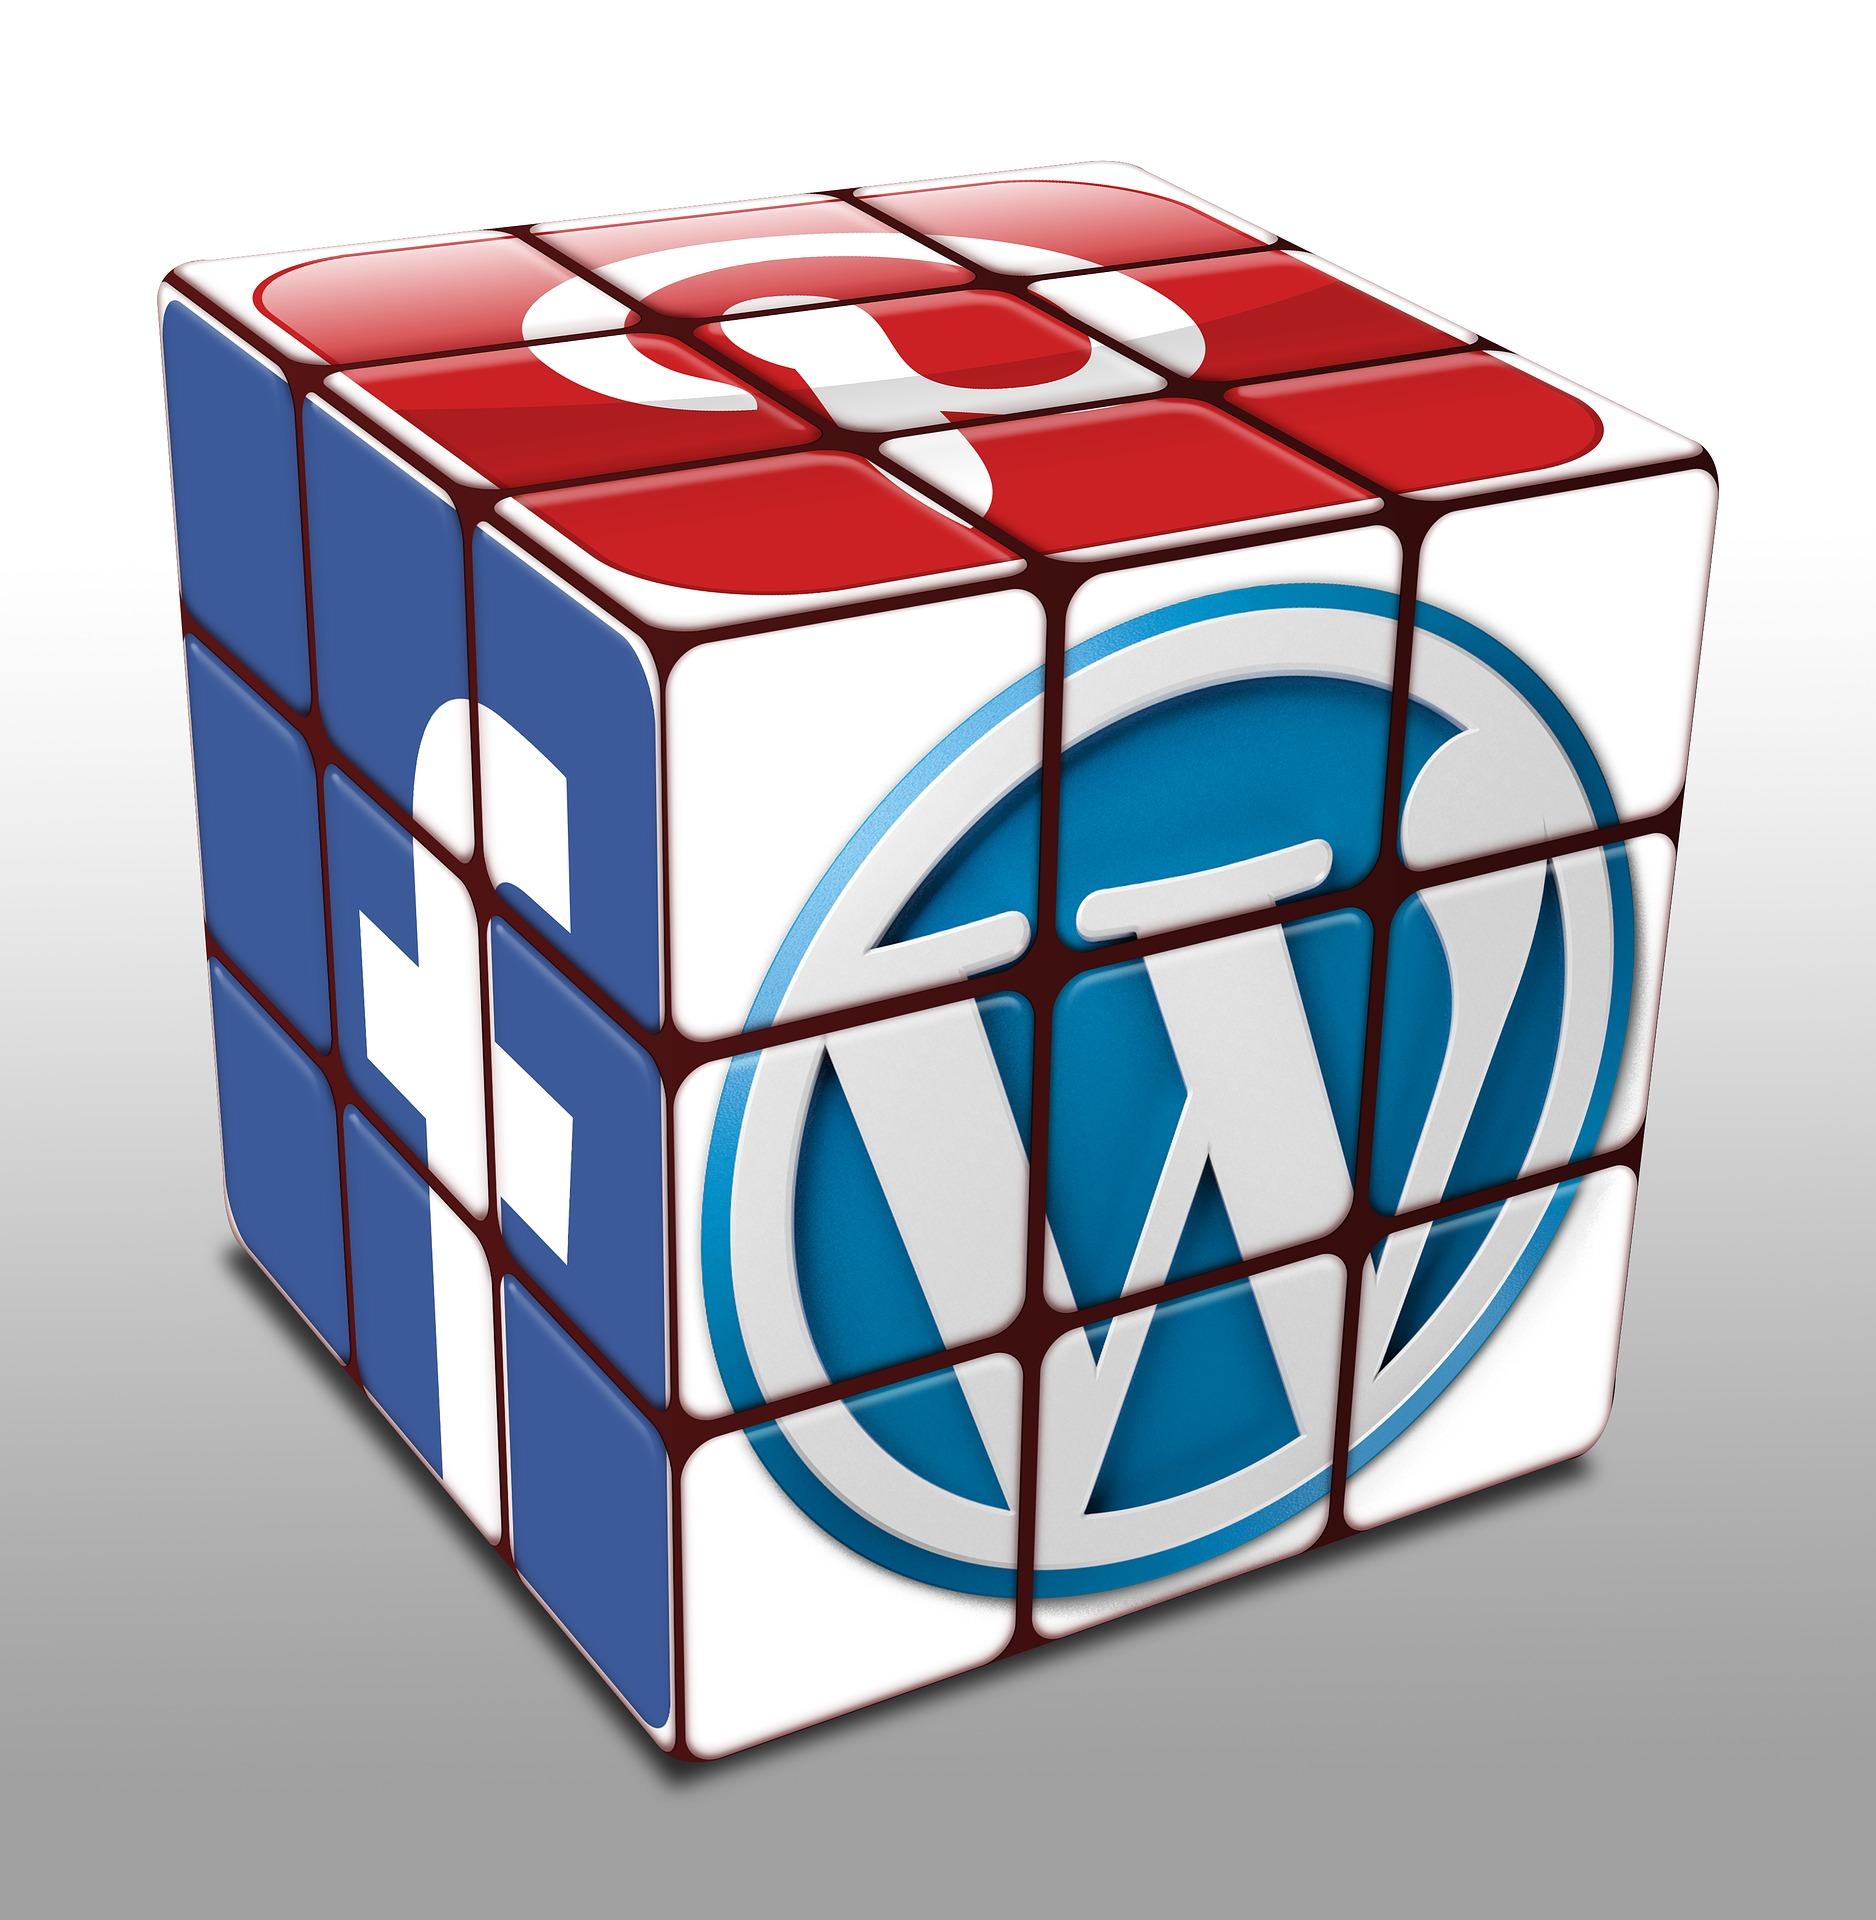 A logo cube image: